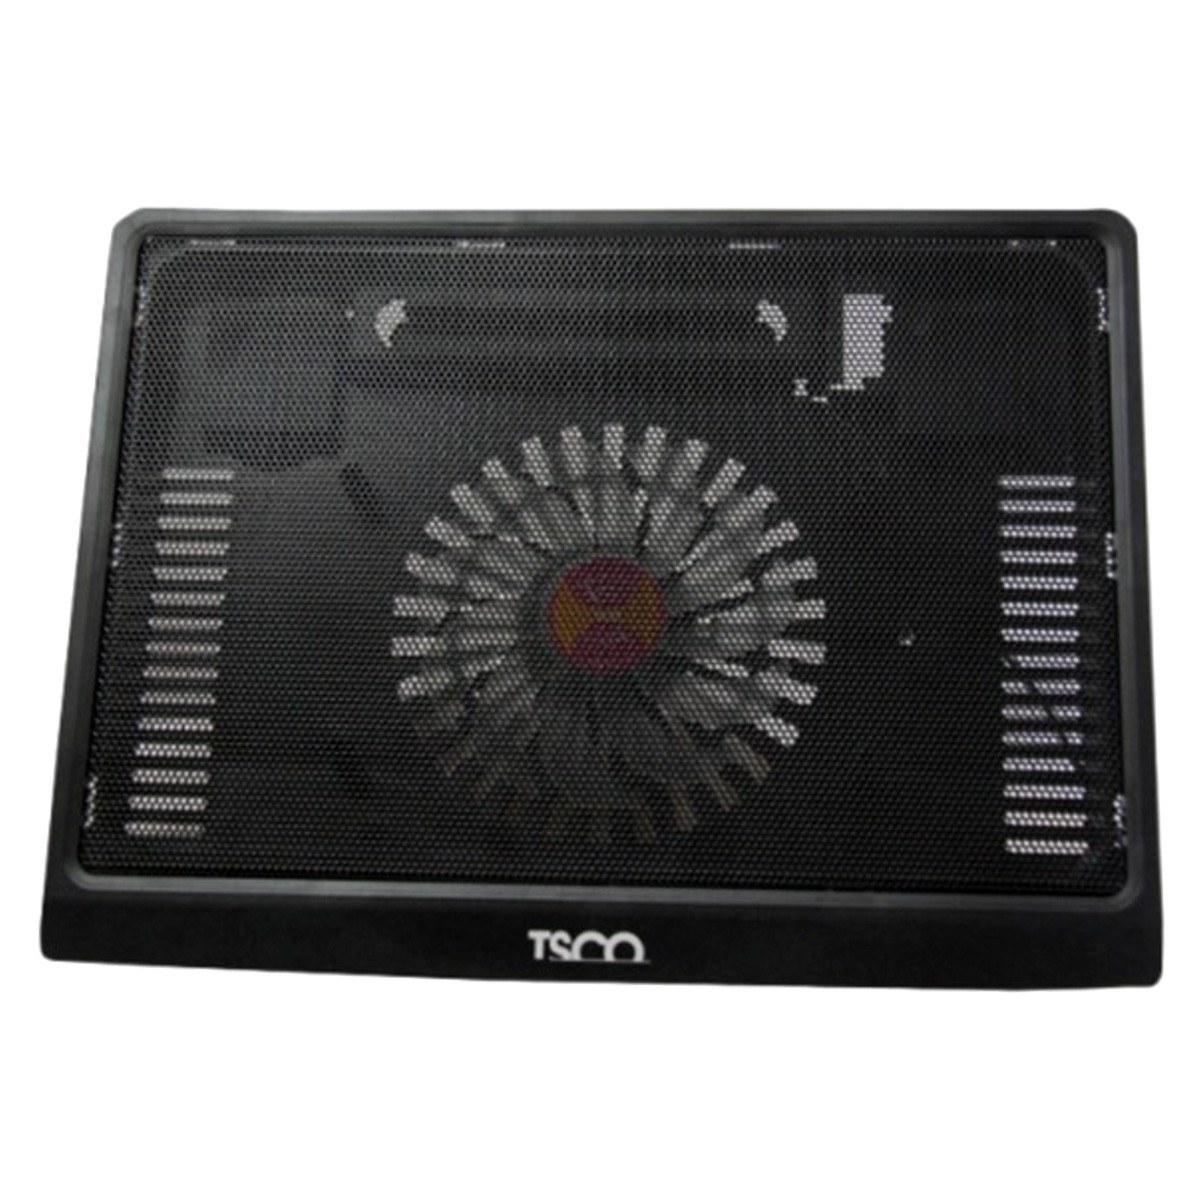 عکس کول پد لپ تاپ زالمن مدل ان سی 3000 اس پایه و خنک کننده لپ تاپ زالمن ZM-NC3000S NoteBook Cooler کول-پد-لپ-تاپ-زالمن-مدل-ان-سی-3000-اس